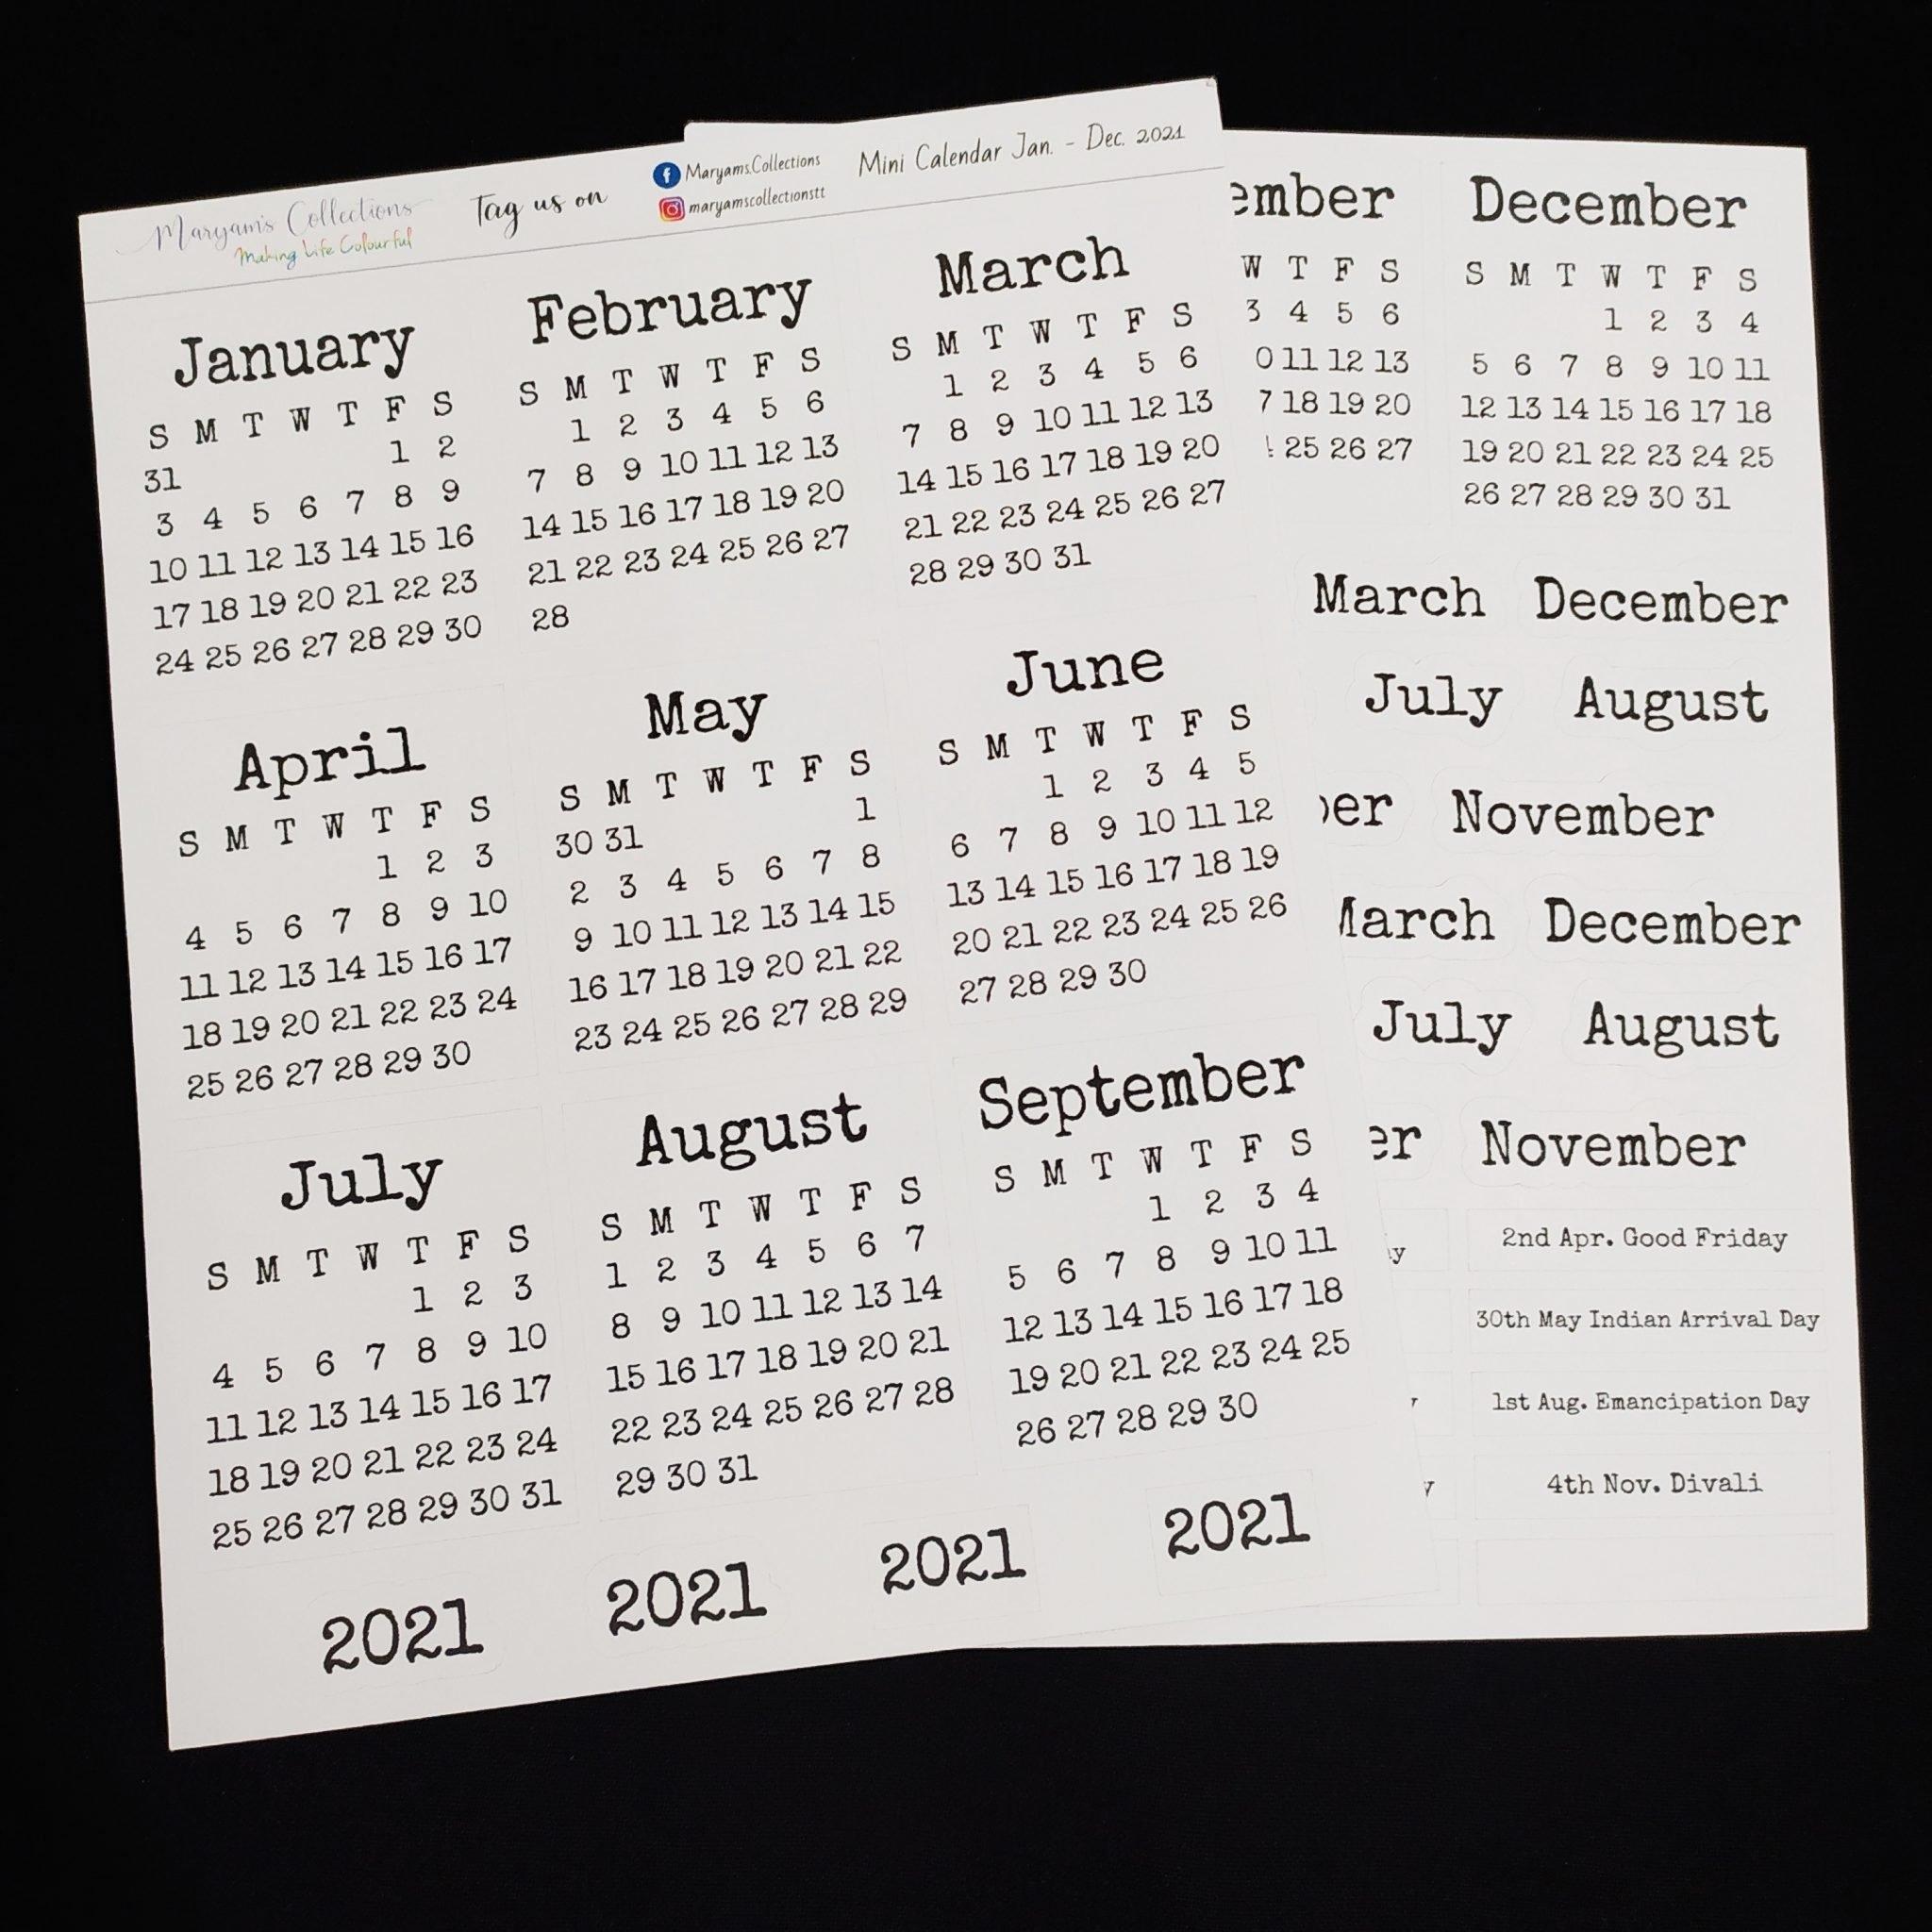 2021 Mini Calendar Stickers - V2 ' - Planting Seeds Digital Pop Up Shop with Trinidad And Tobago Holidays 2021 Graphics